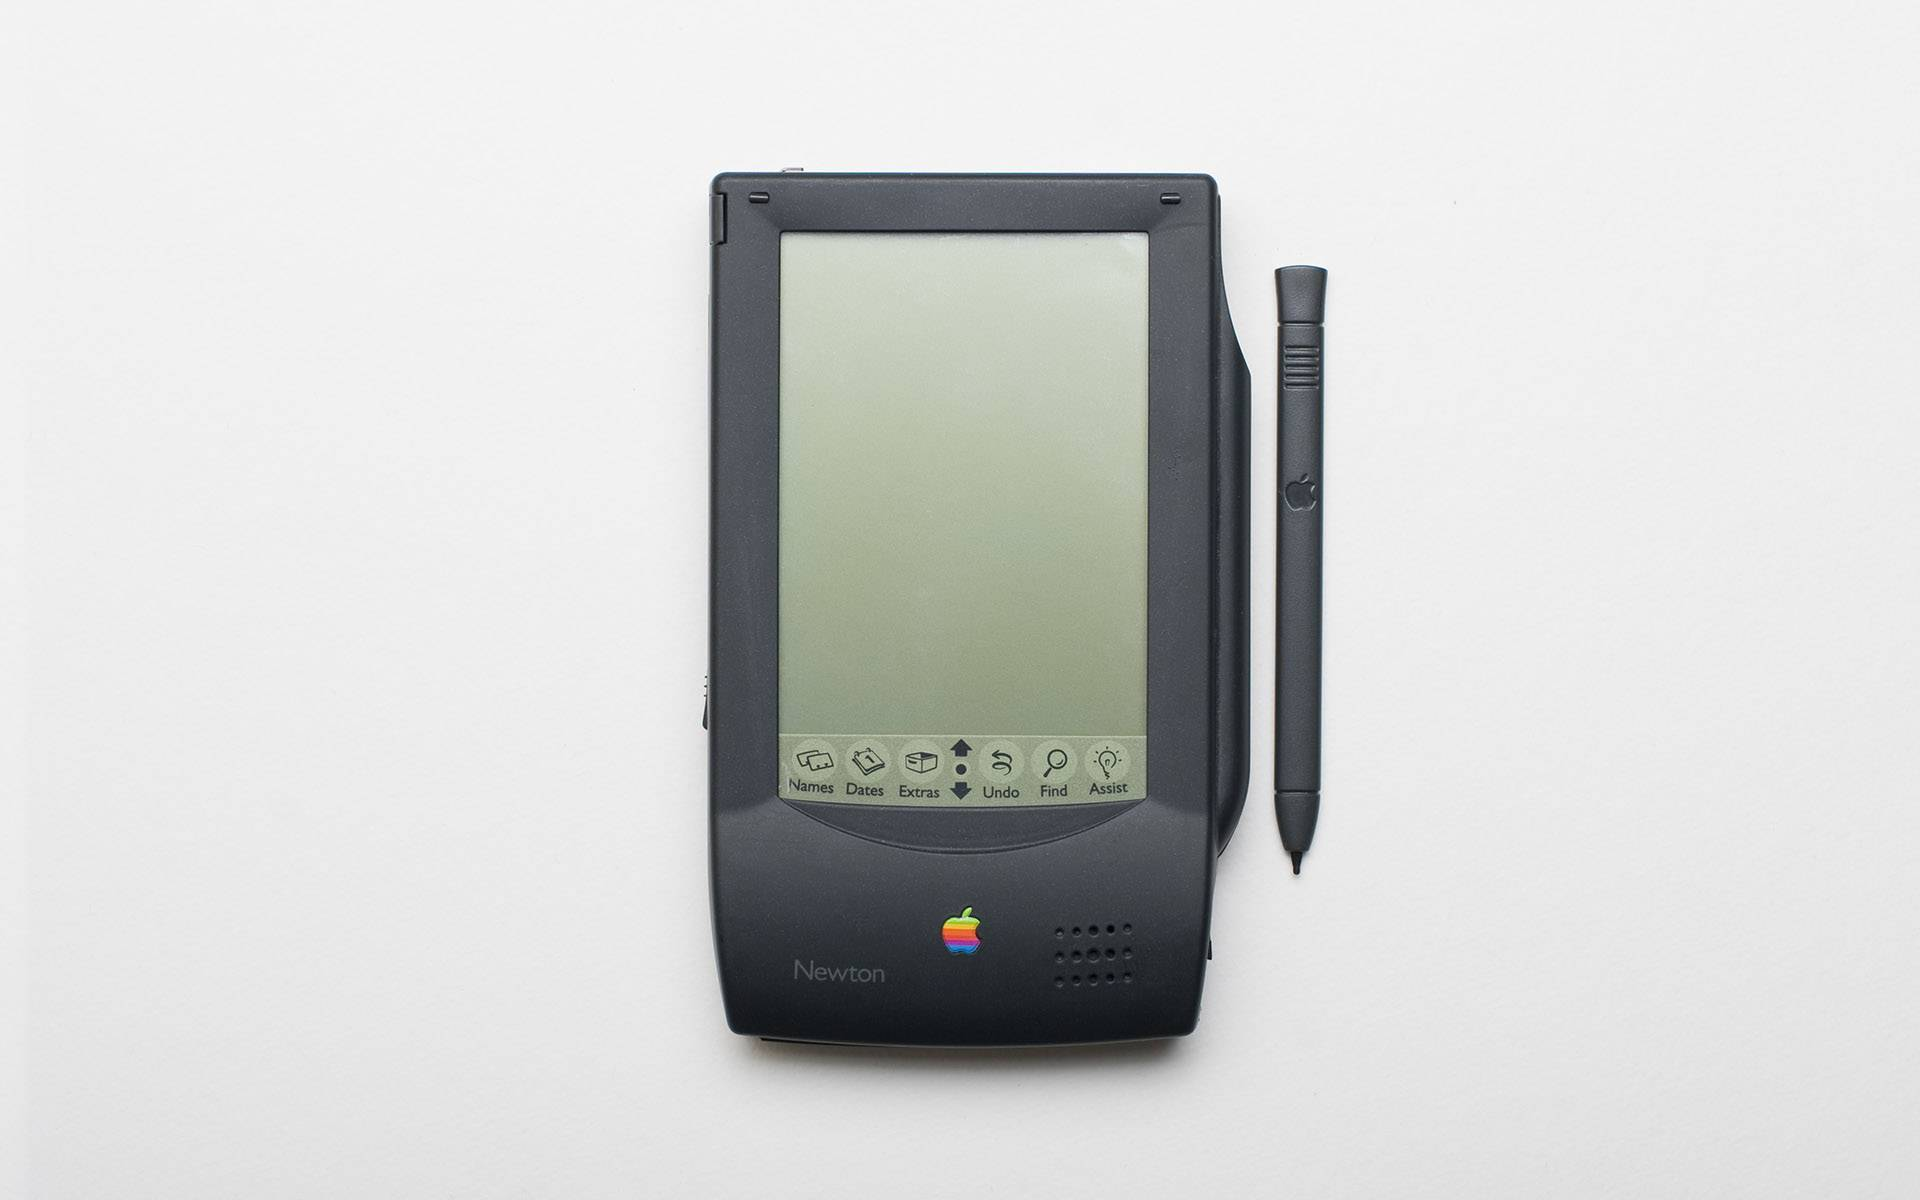 Apple Newton with ARM inside